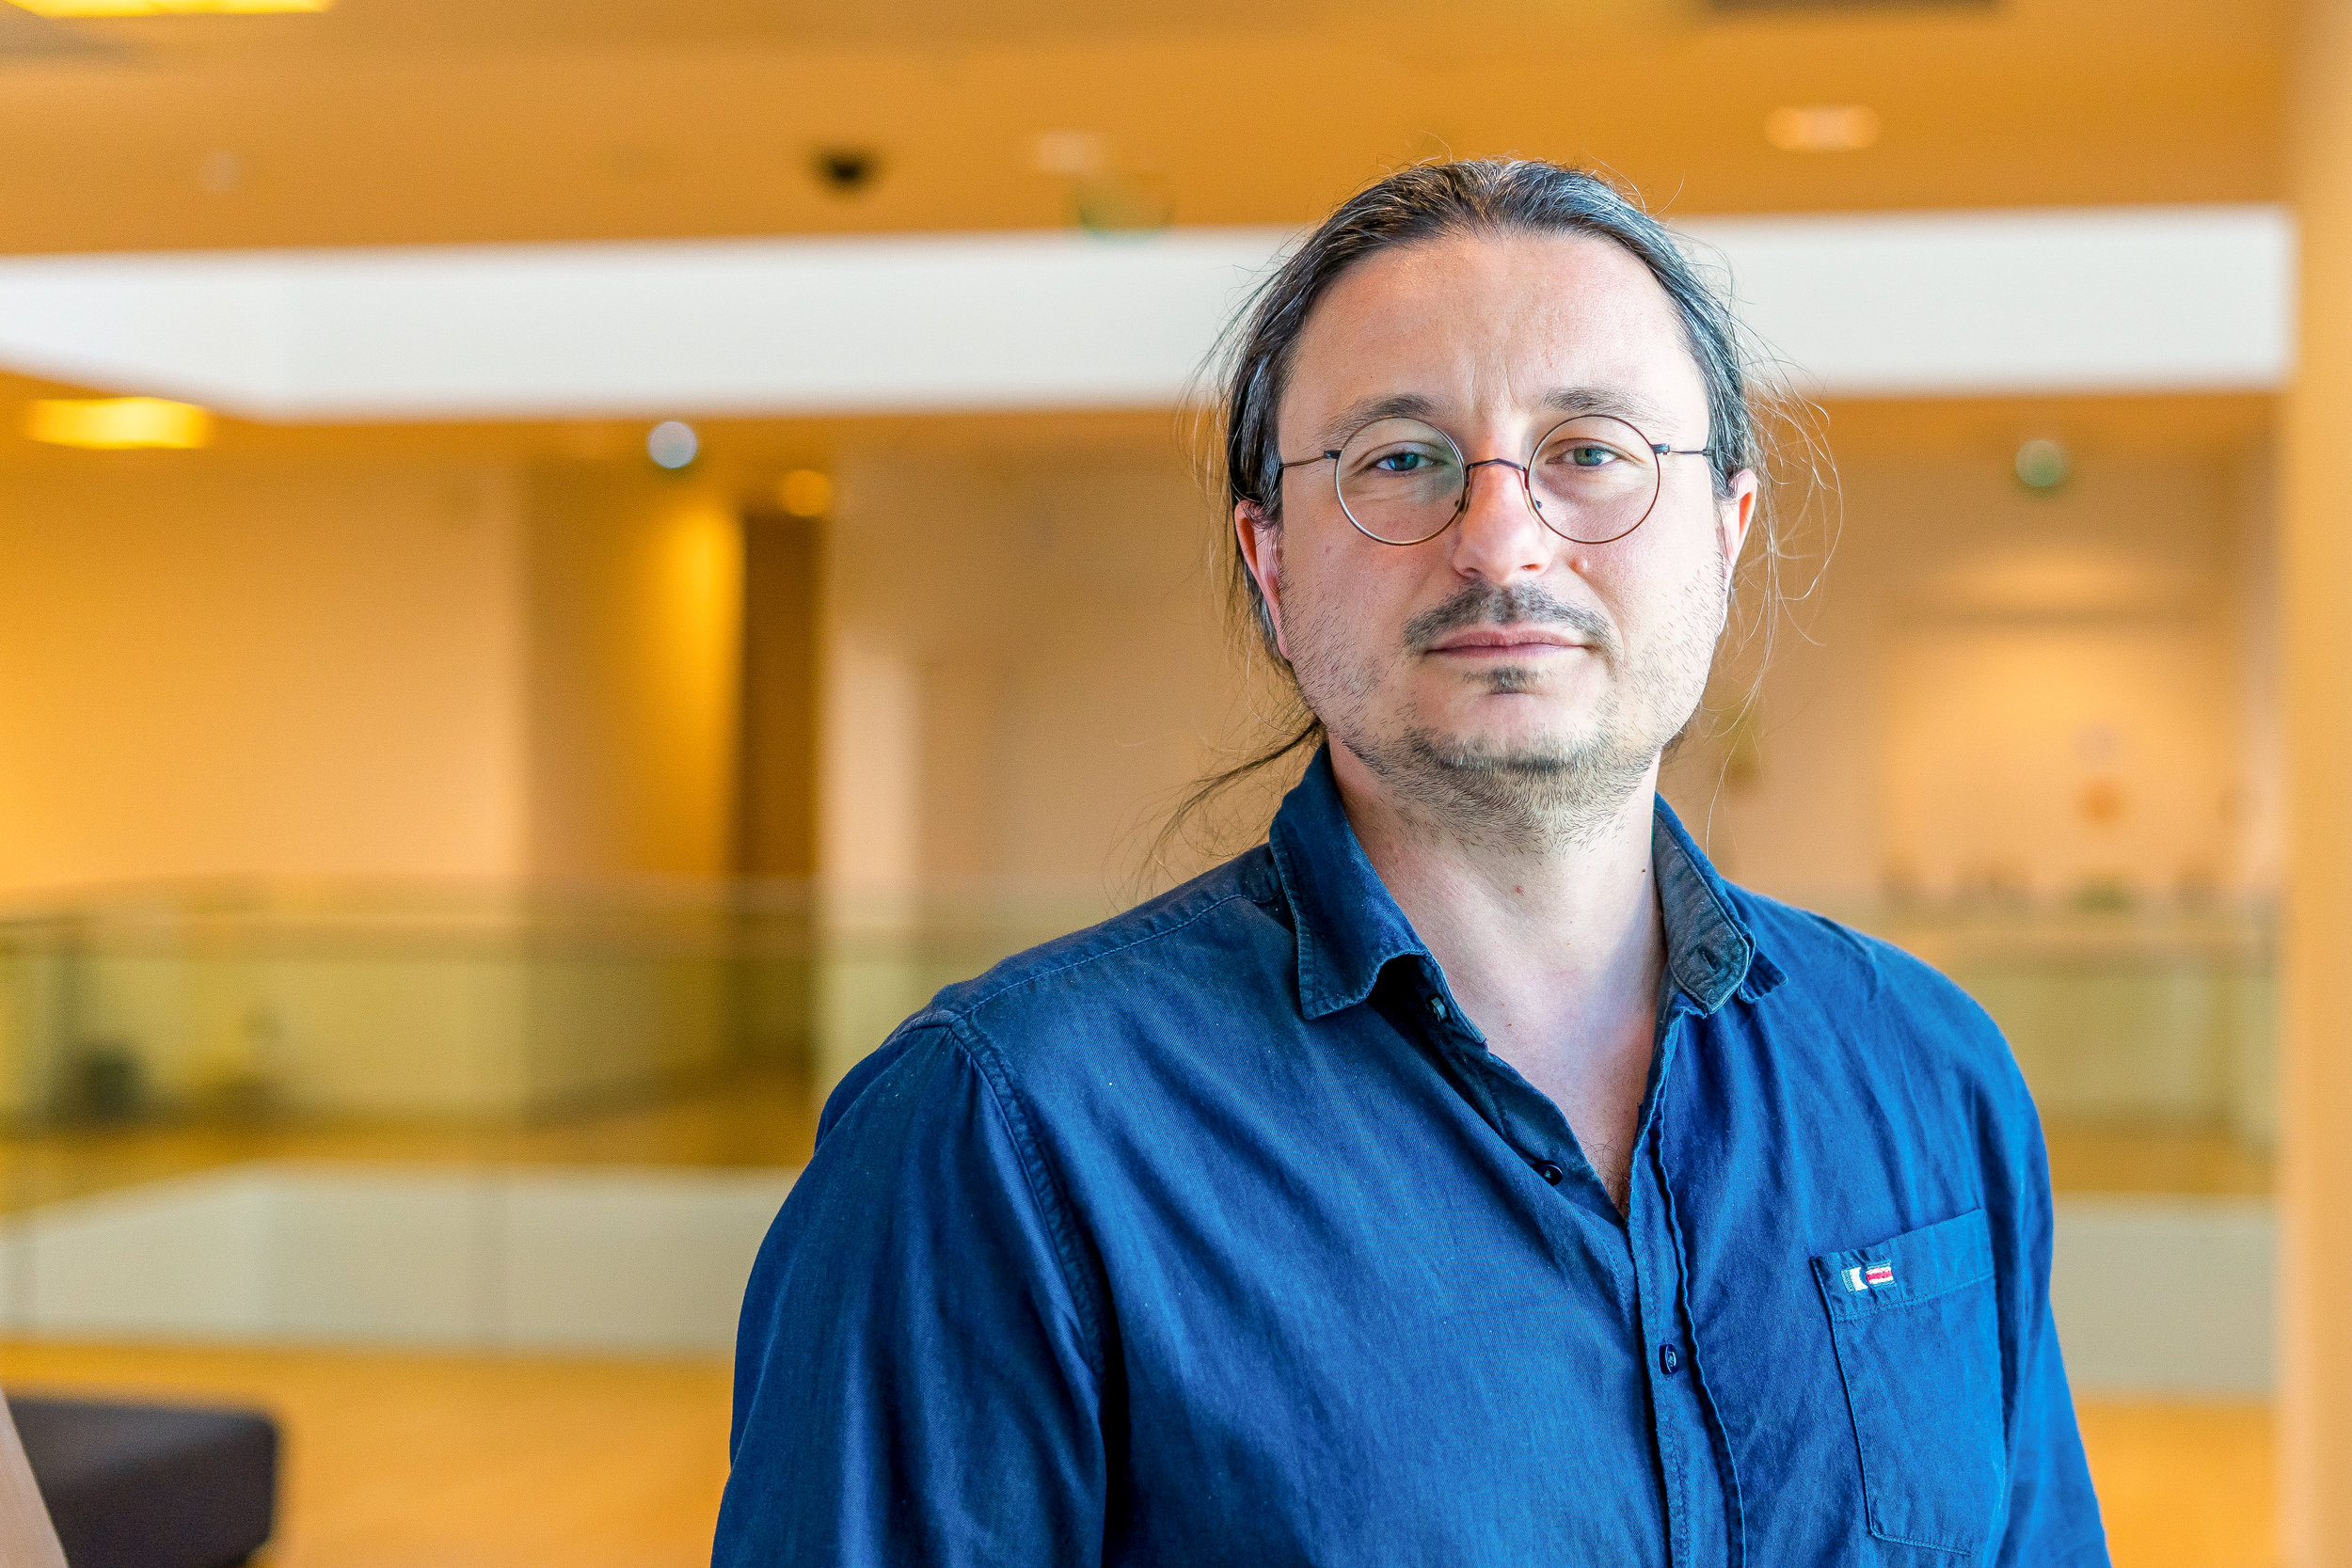 Julien Javaloyes - Senior Lecturer at the Physics DepartmentUniversitat de les Illes Balears